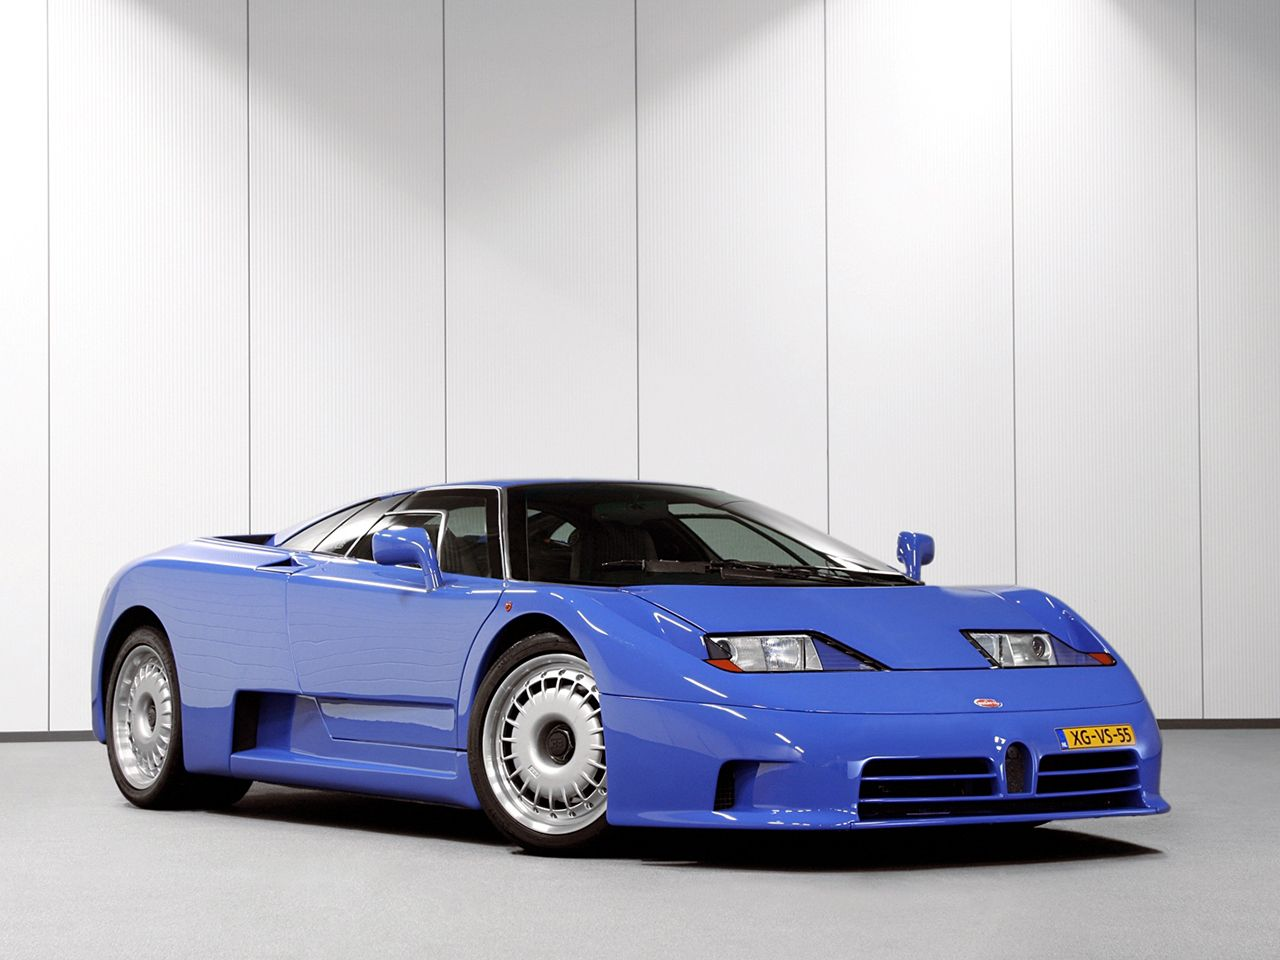 1992-95 Bugatti EB110 GT   Bugatti eb110, Bugatti, Super cars